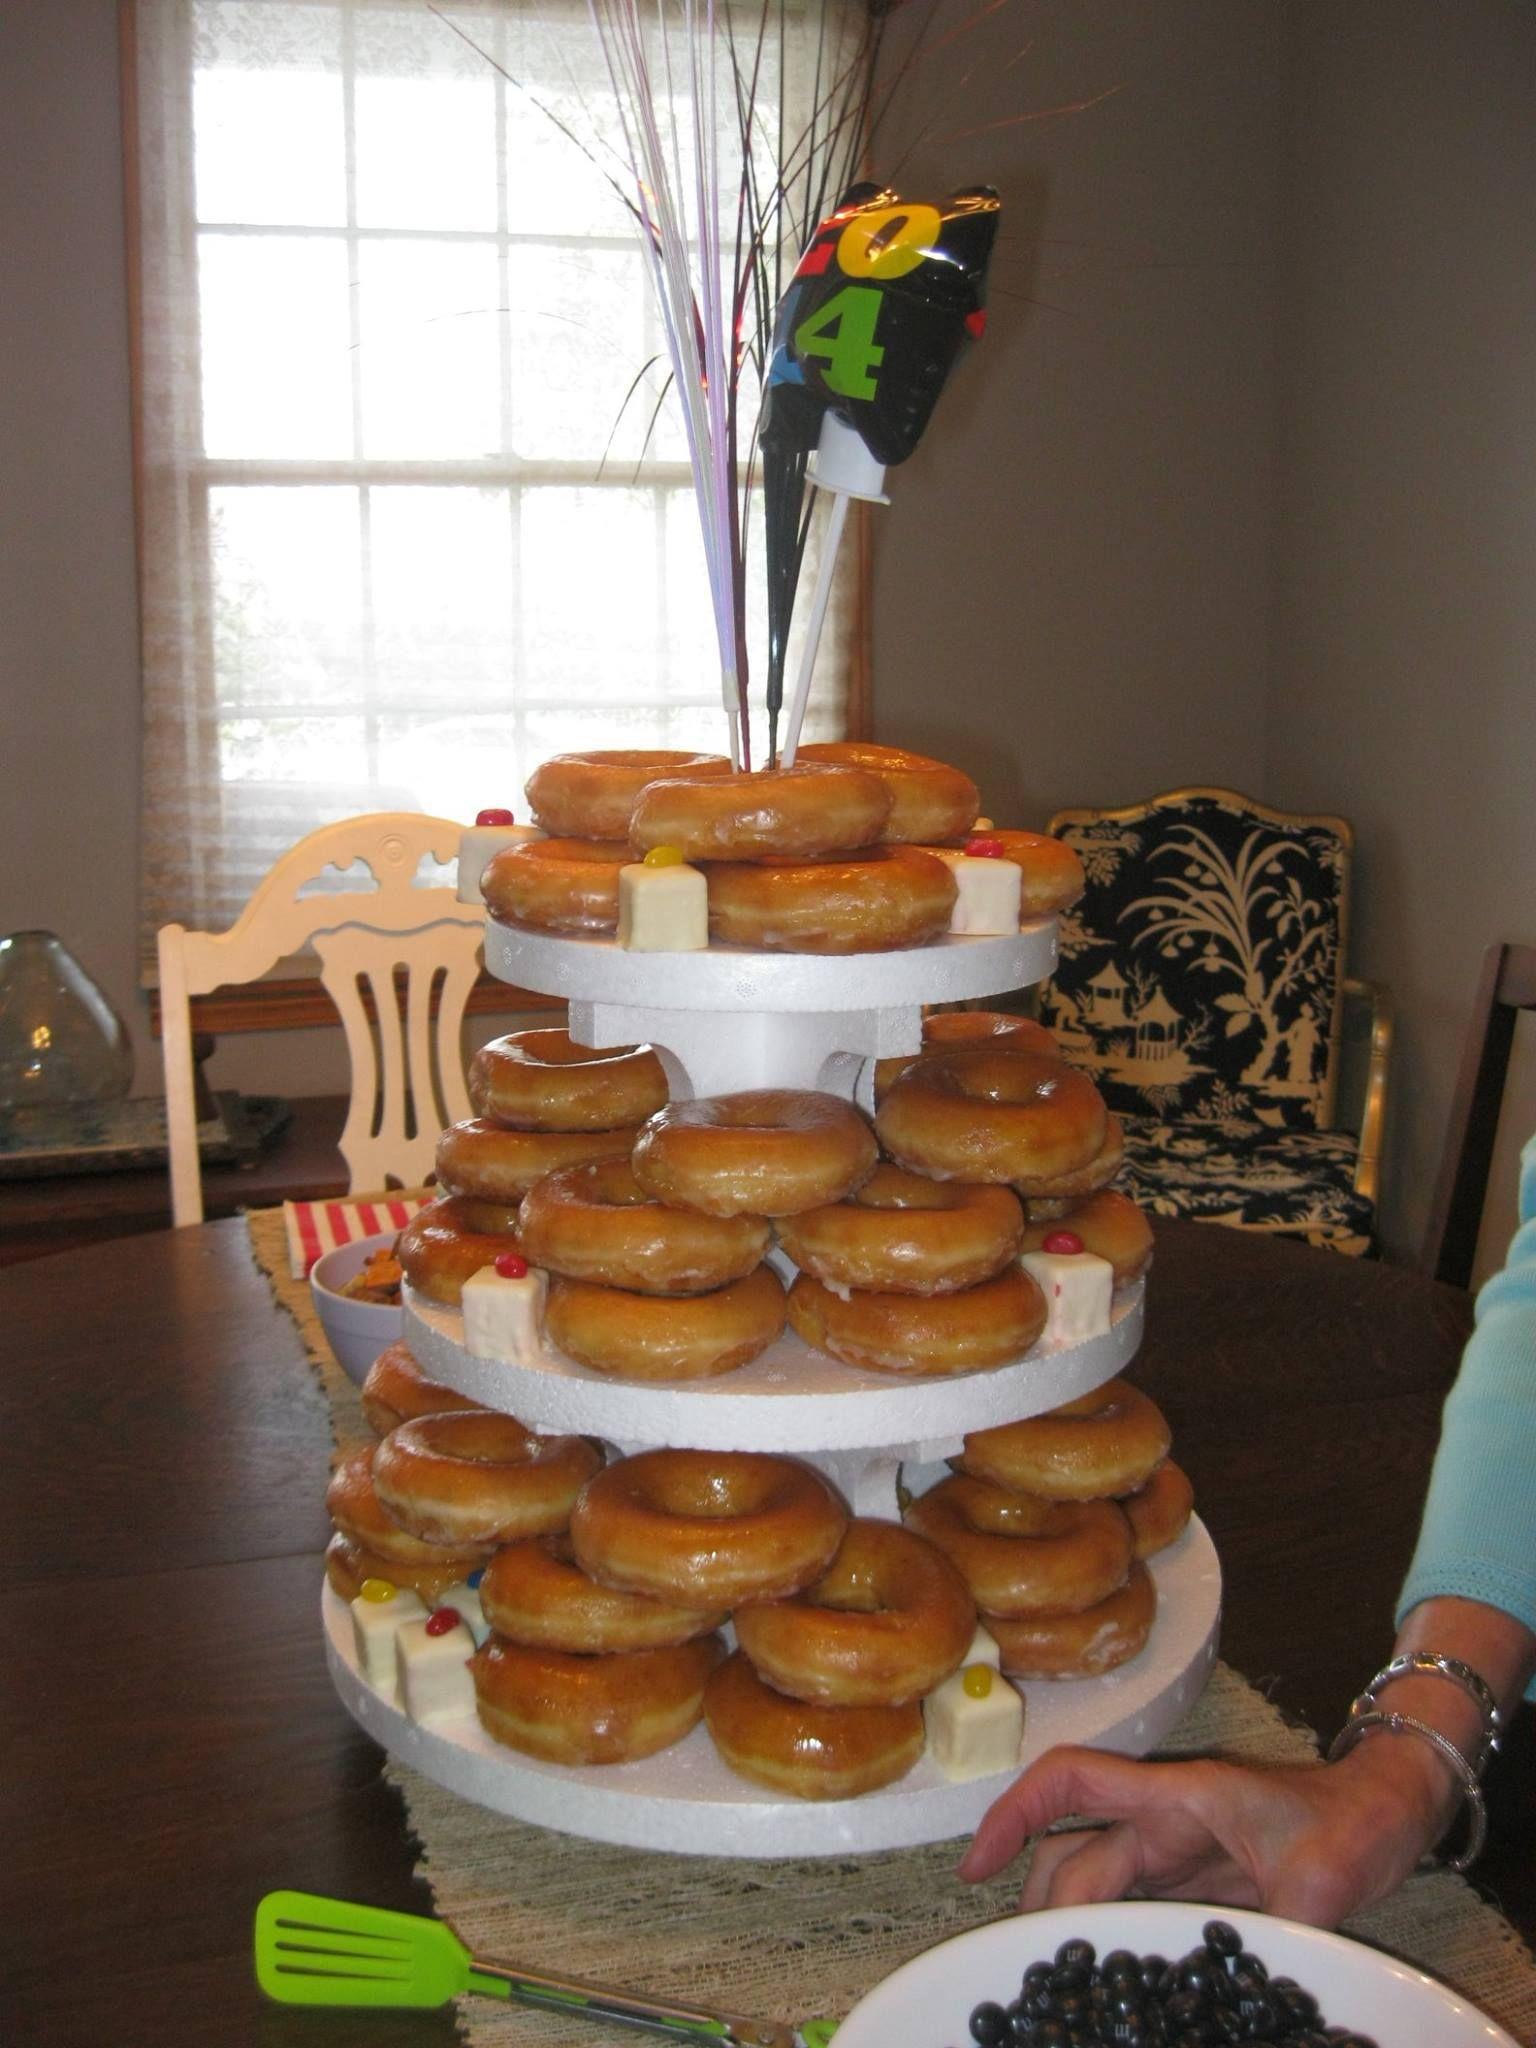 Knockoff Krispy Kreme Donuts recipe using an air fryer